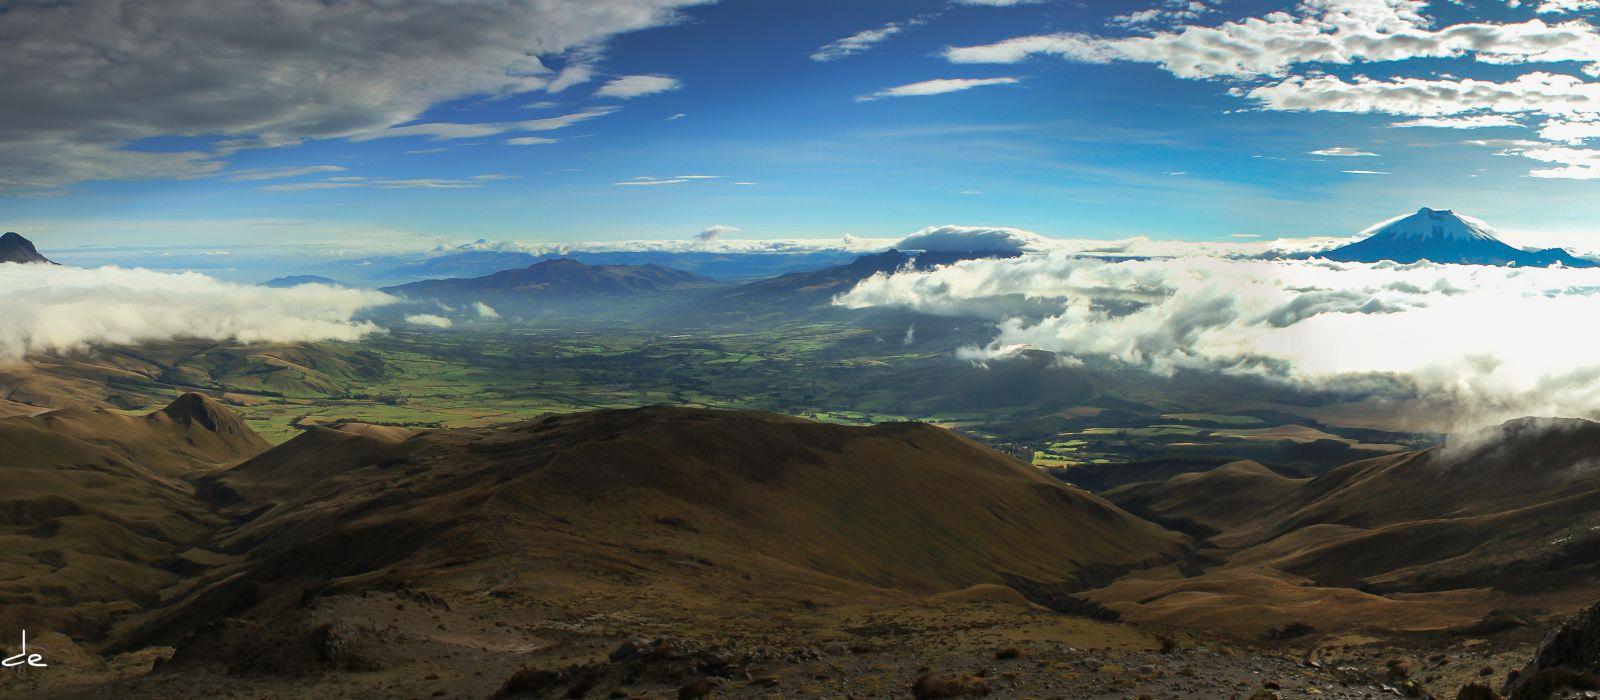 Der Vulkan Cotopaxi in Ecuador: Fabian Franke | Enchanting Travels